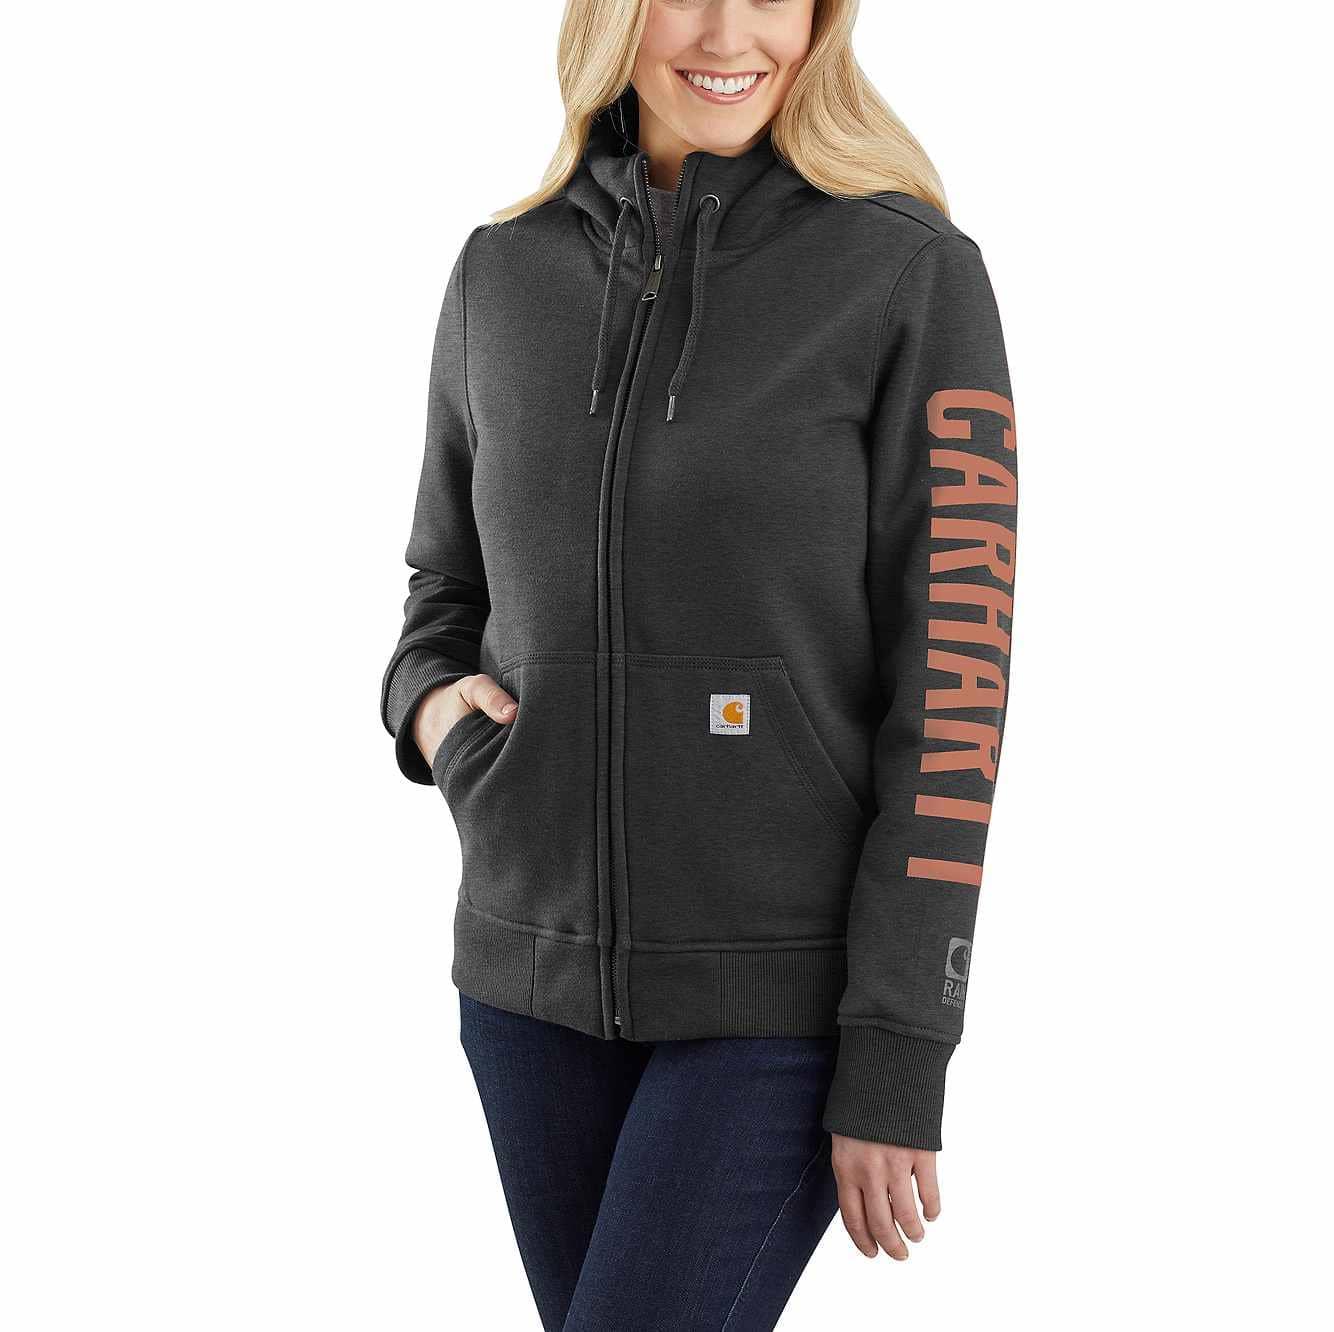 Picture of Rain Defender Original Fit Fleece Lined Logo Graphic Sweatshirt in Carbon Heather